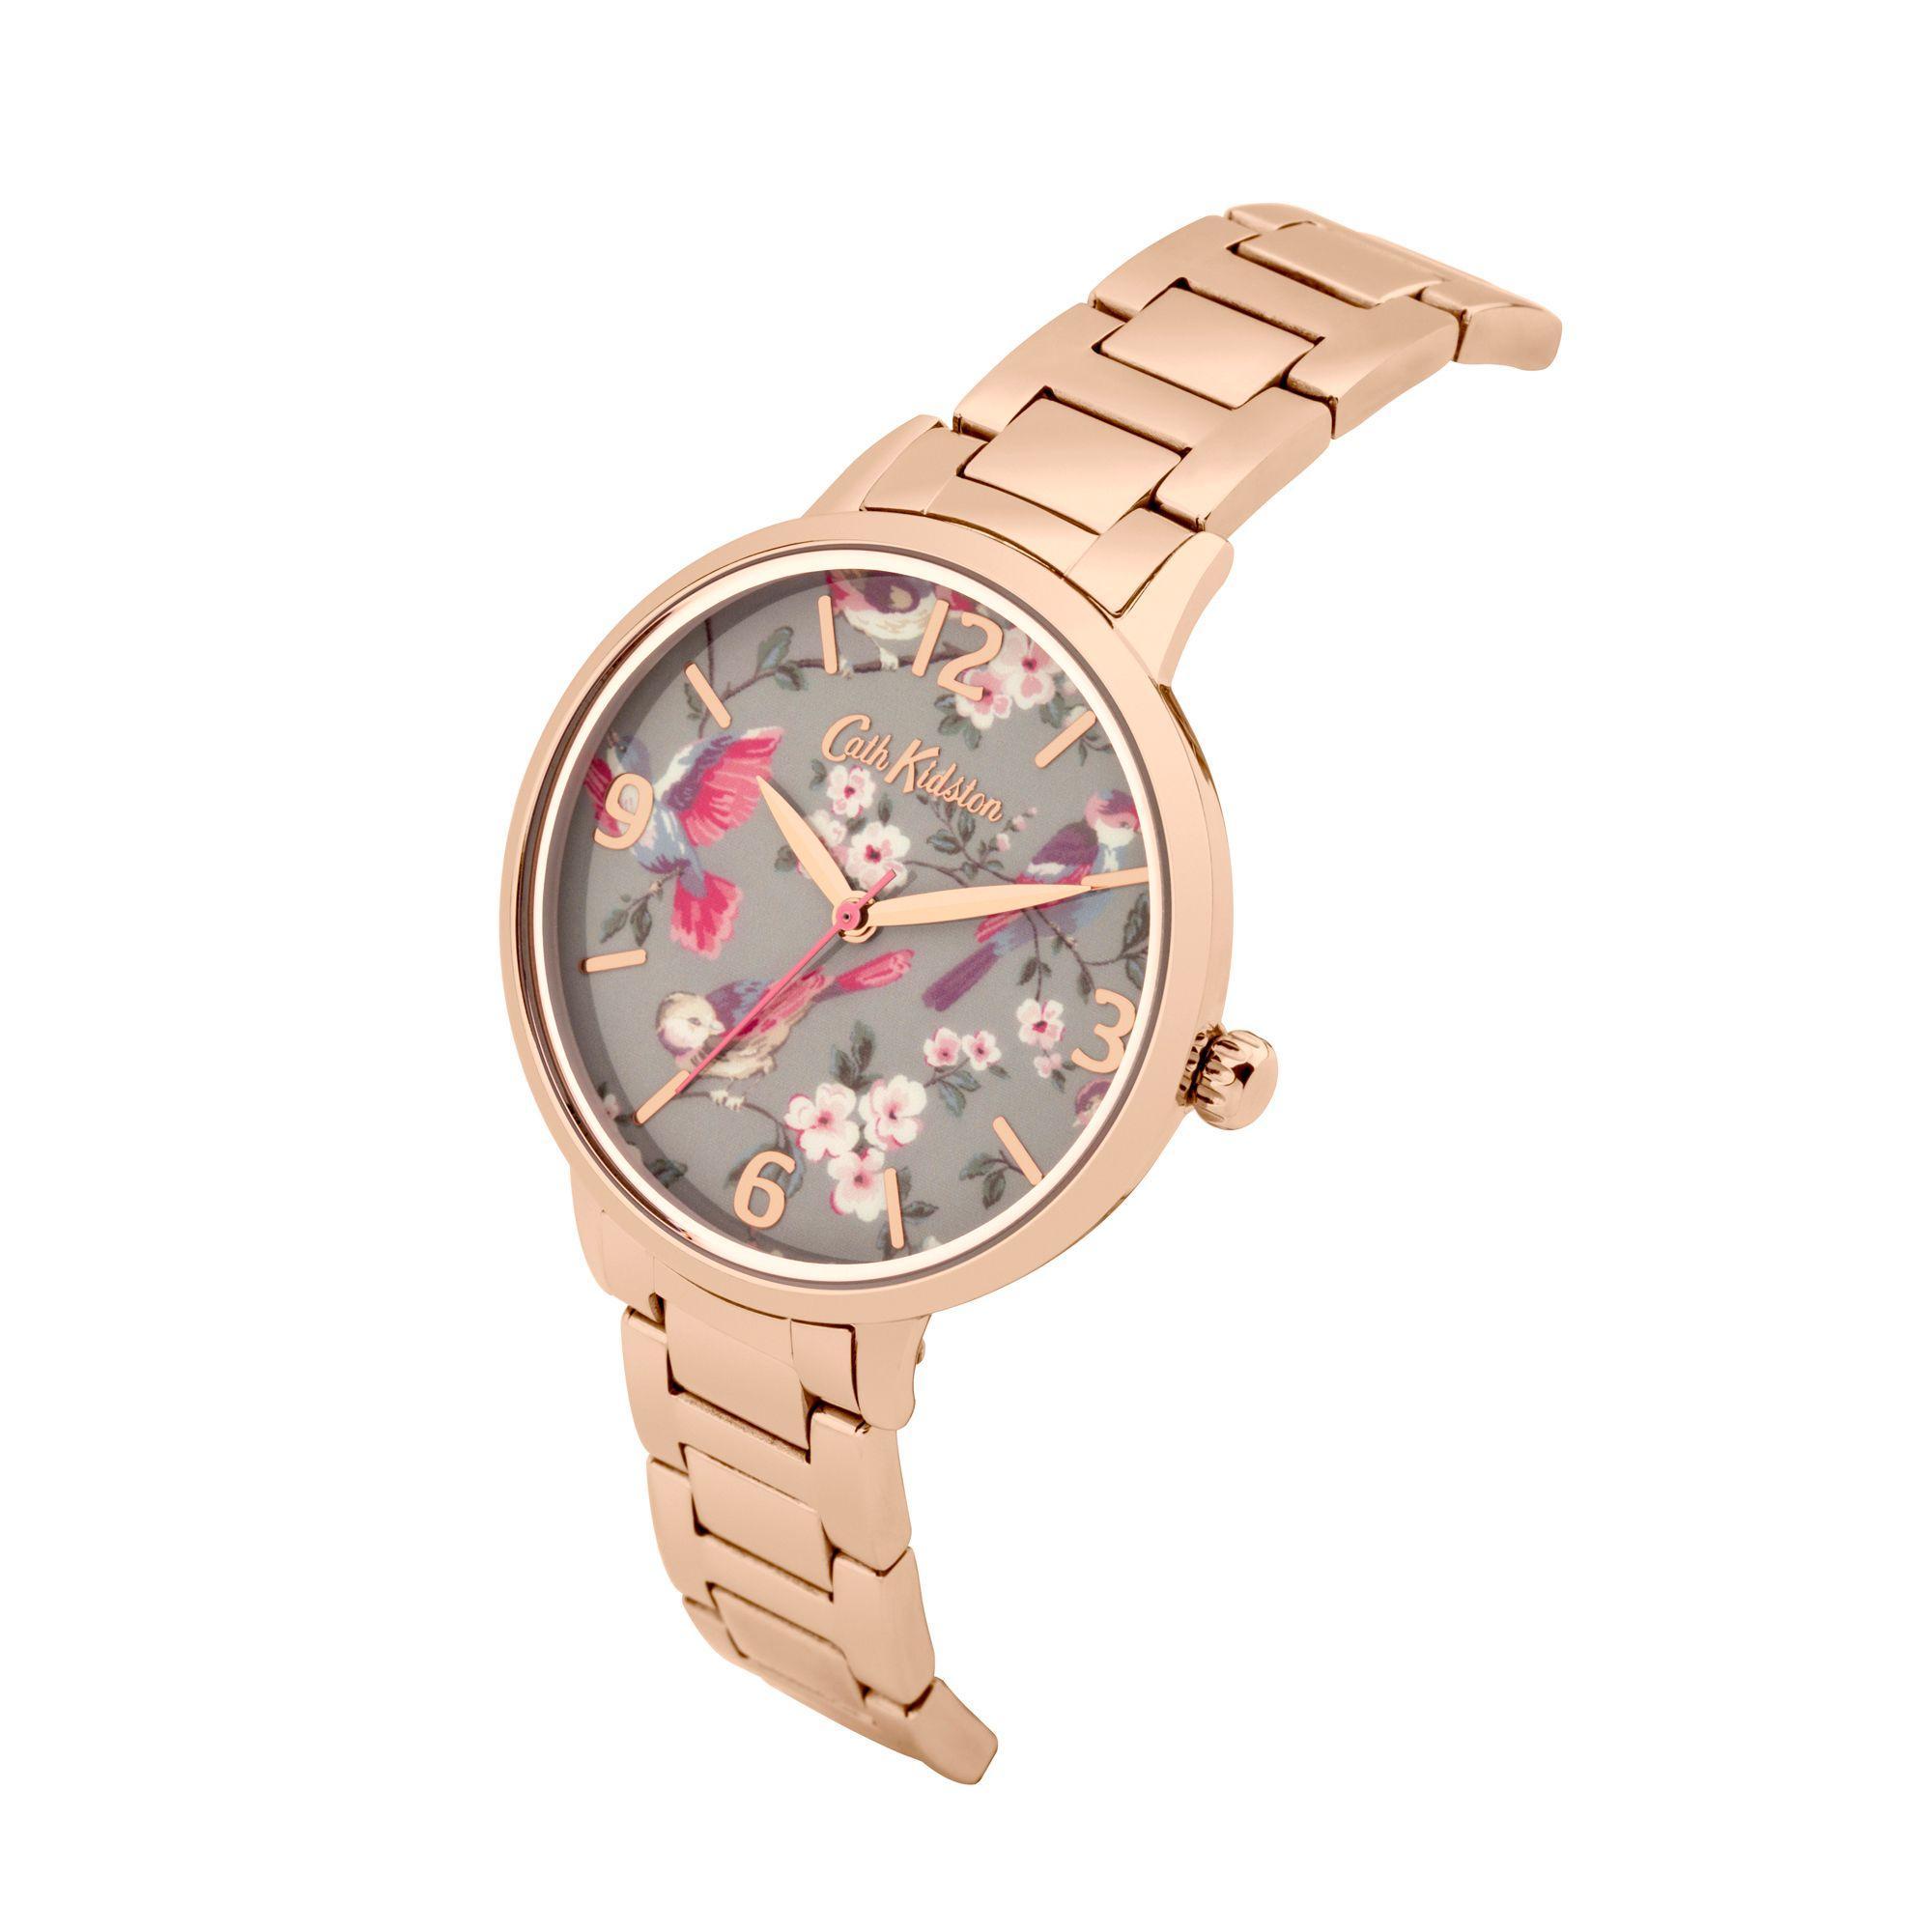 172ab57e9e044 Cath Kidston Pink Ladies Rose Gold Bracelet Watch Ckl001rgm